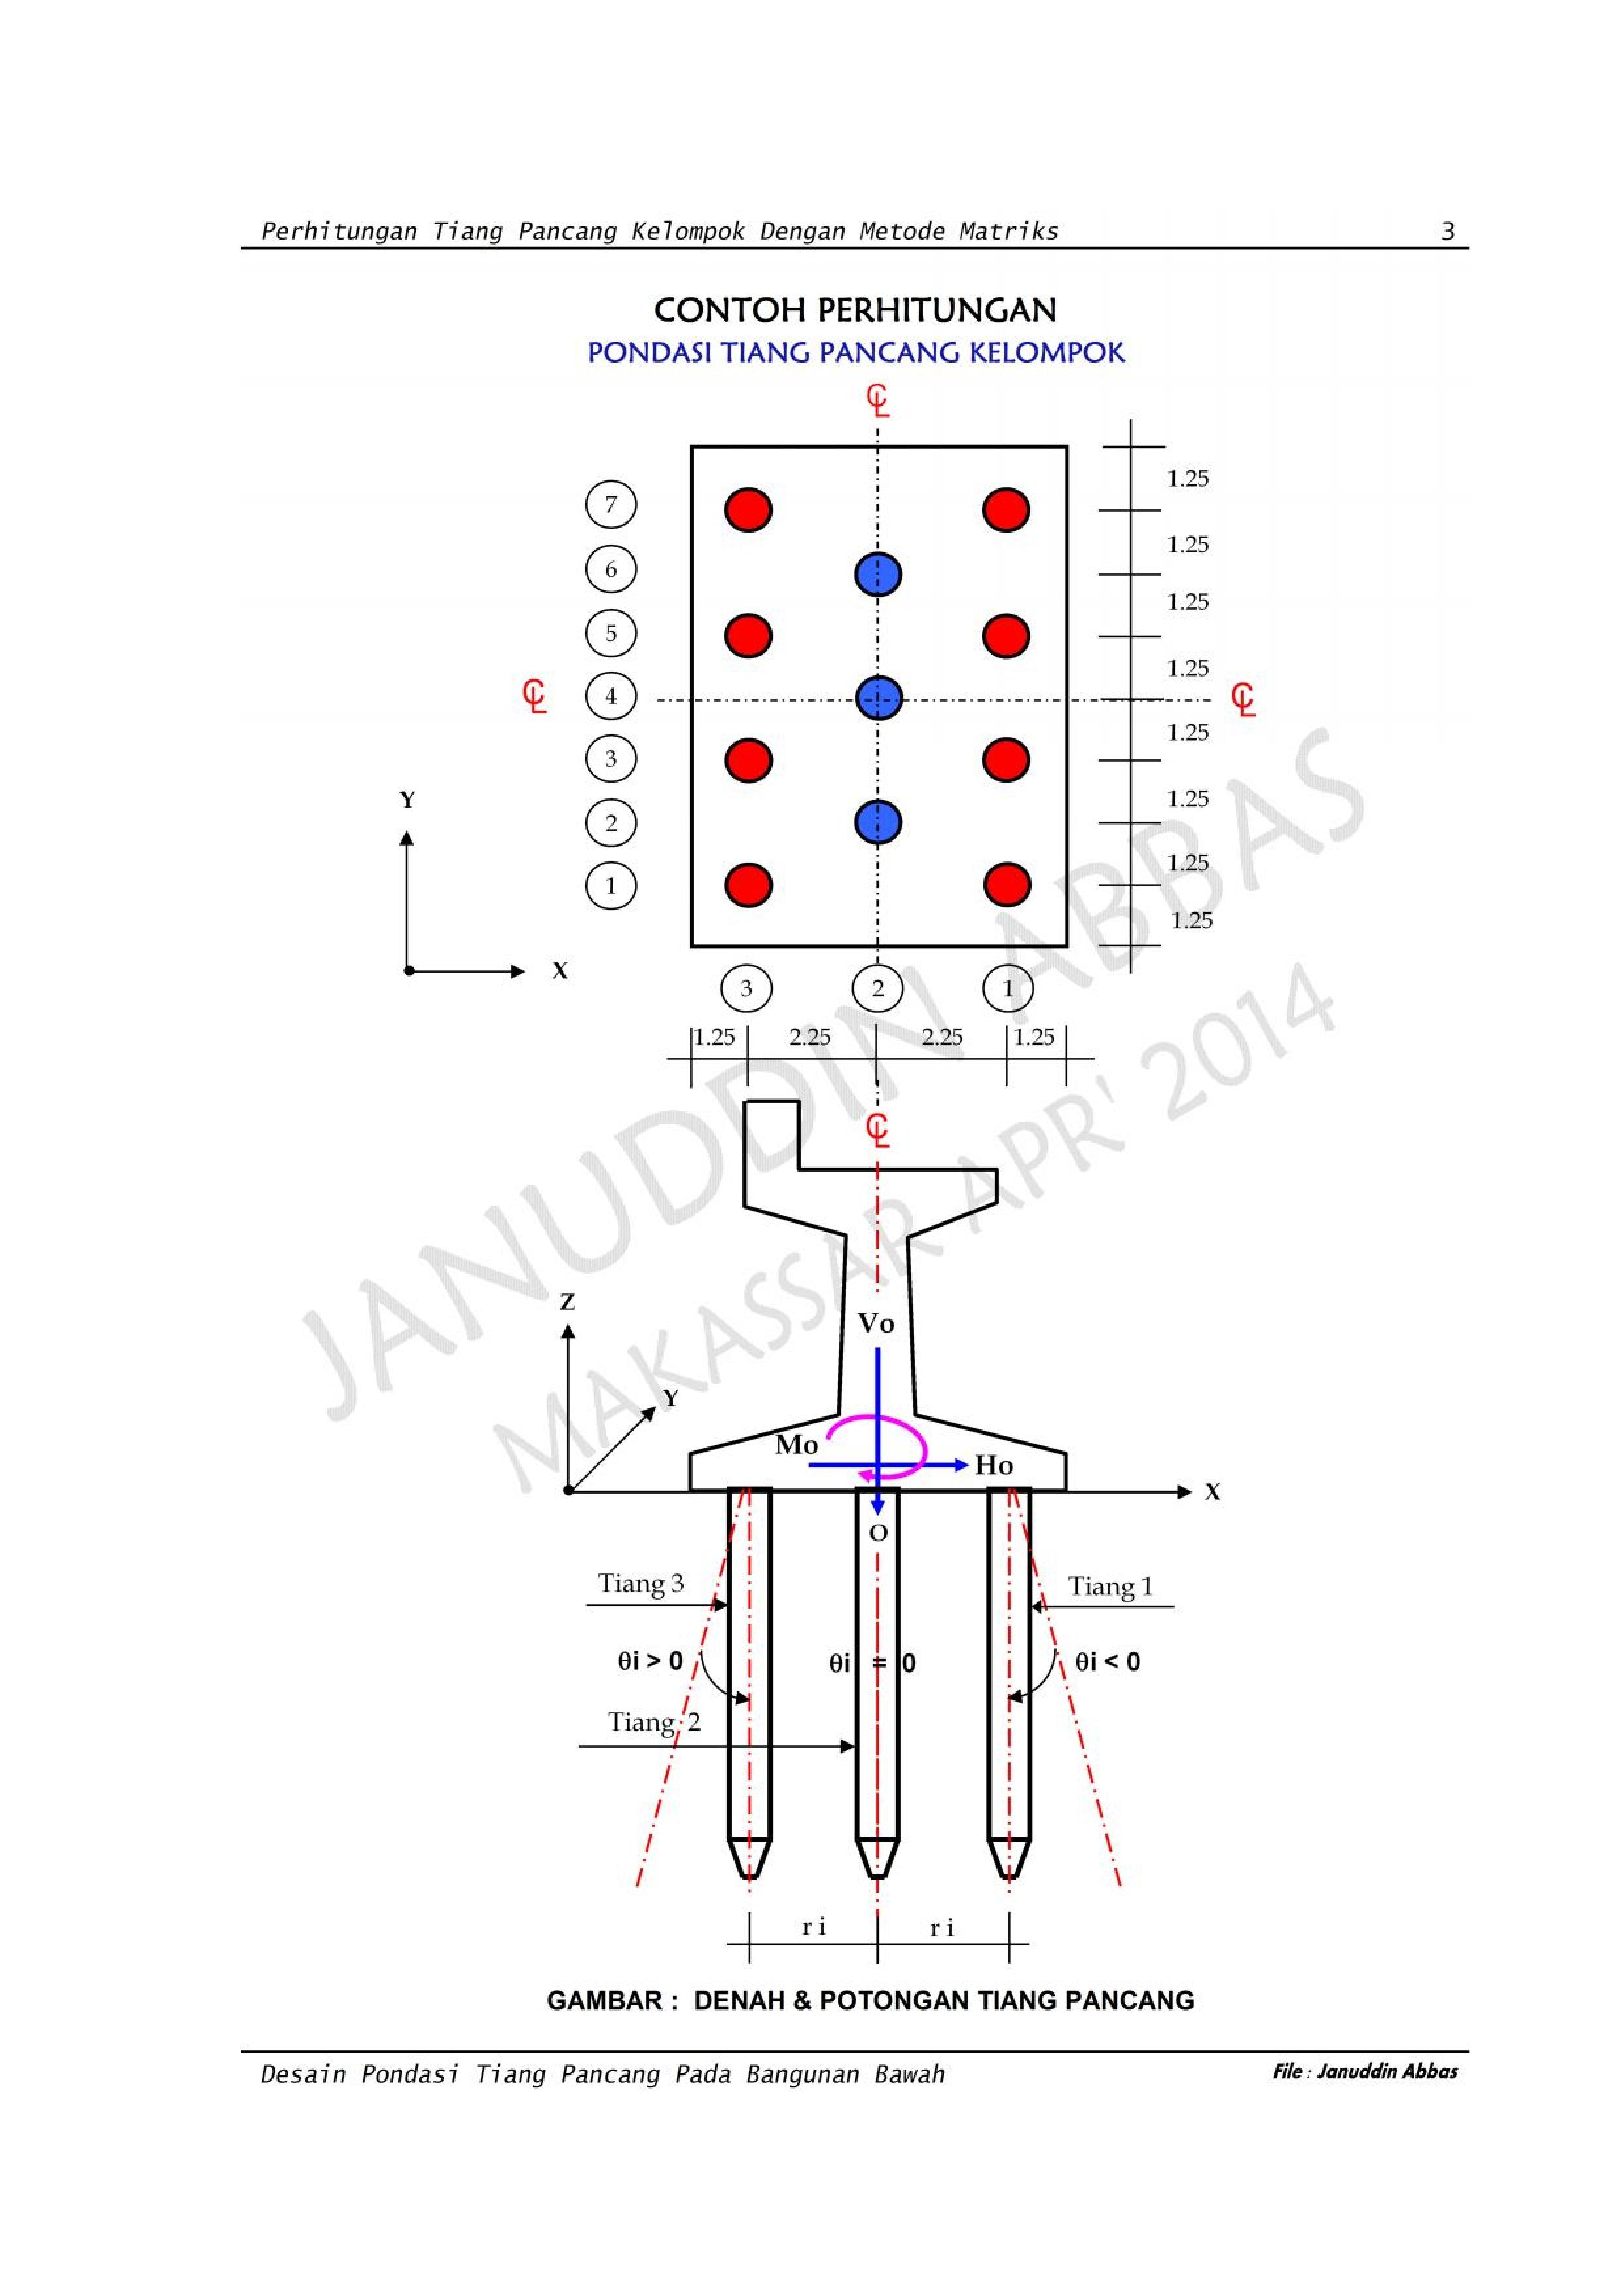 Perhitungan Tiang Pancang Kelompok Peninjauan Beban Dua Arah Metode Matriks  ilmutekniksipilcom